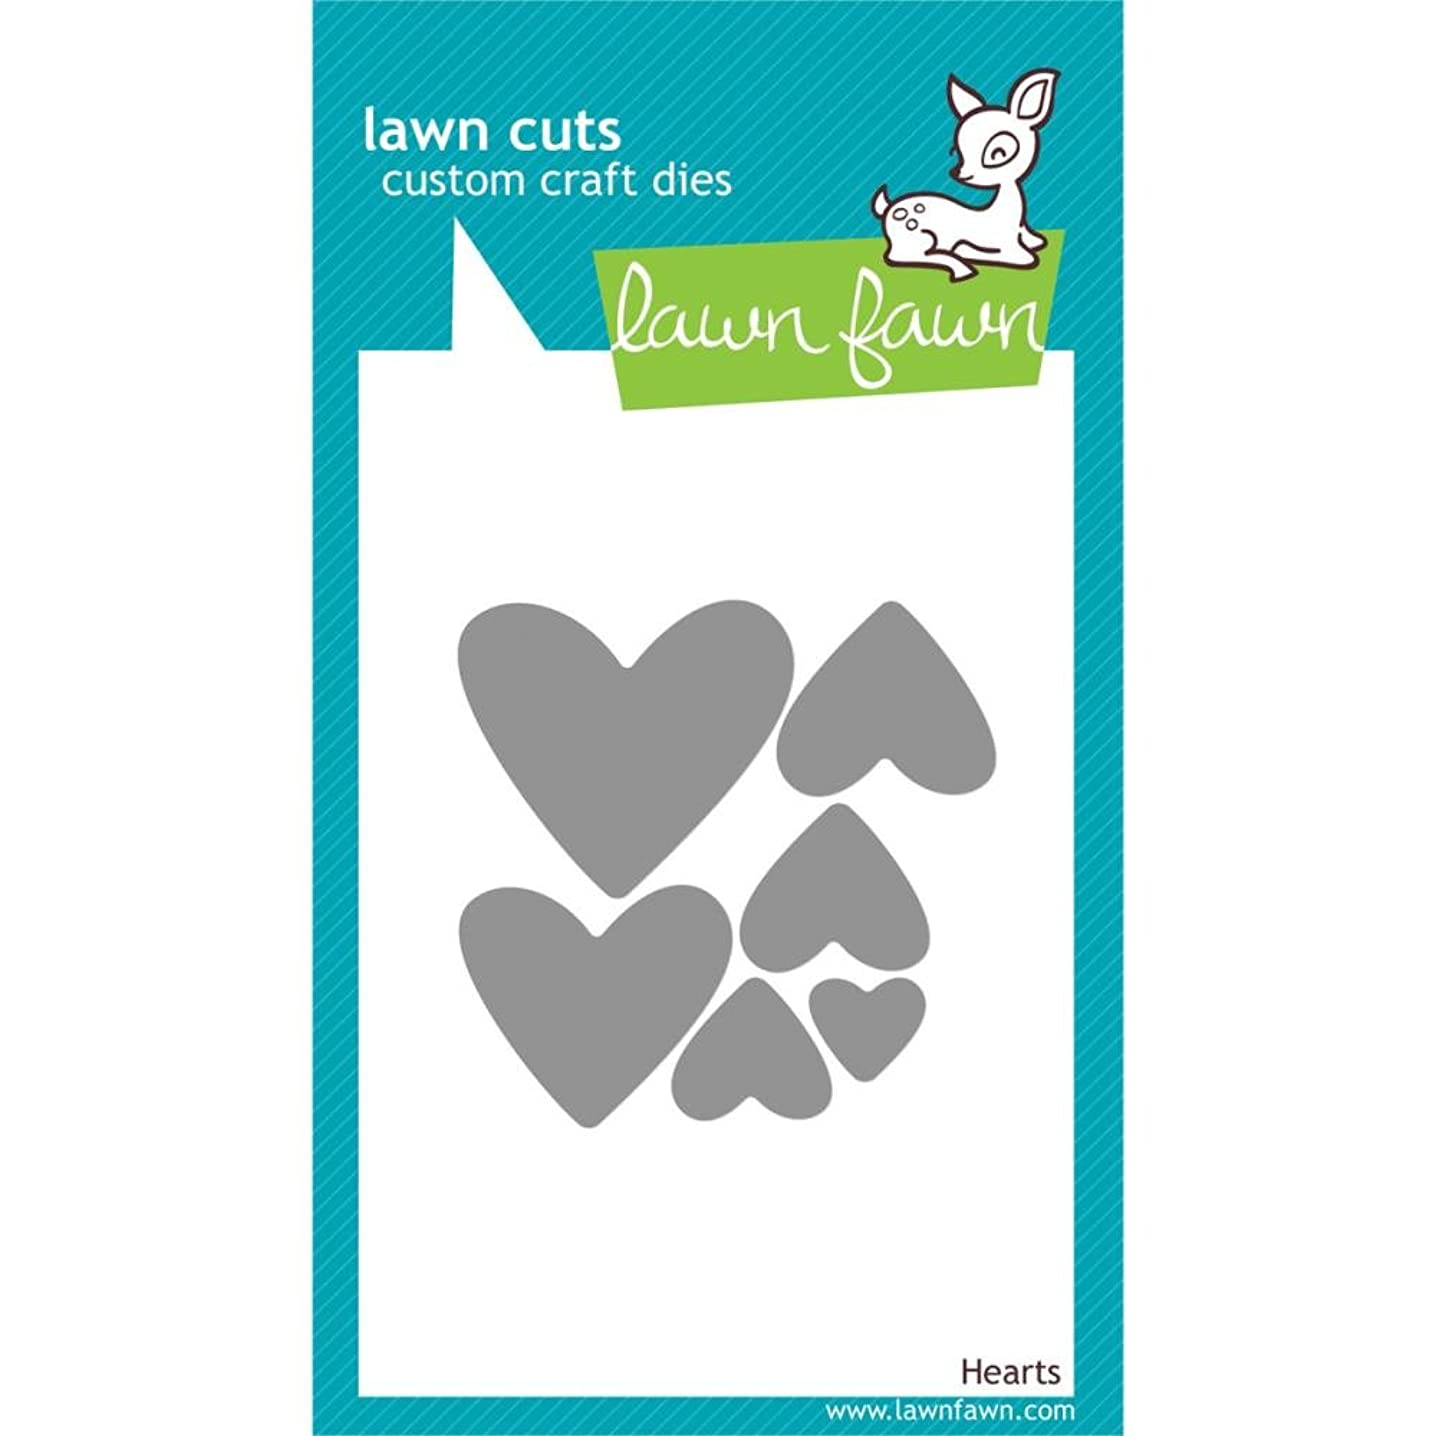 Lawn Fawn Lawn Cuts Custom Craft Dies - Hearts #LF492